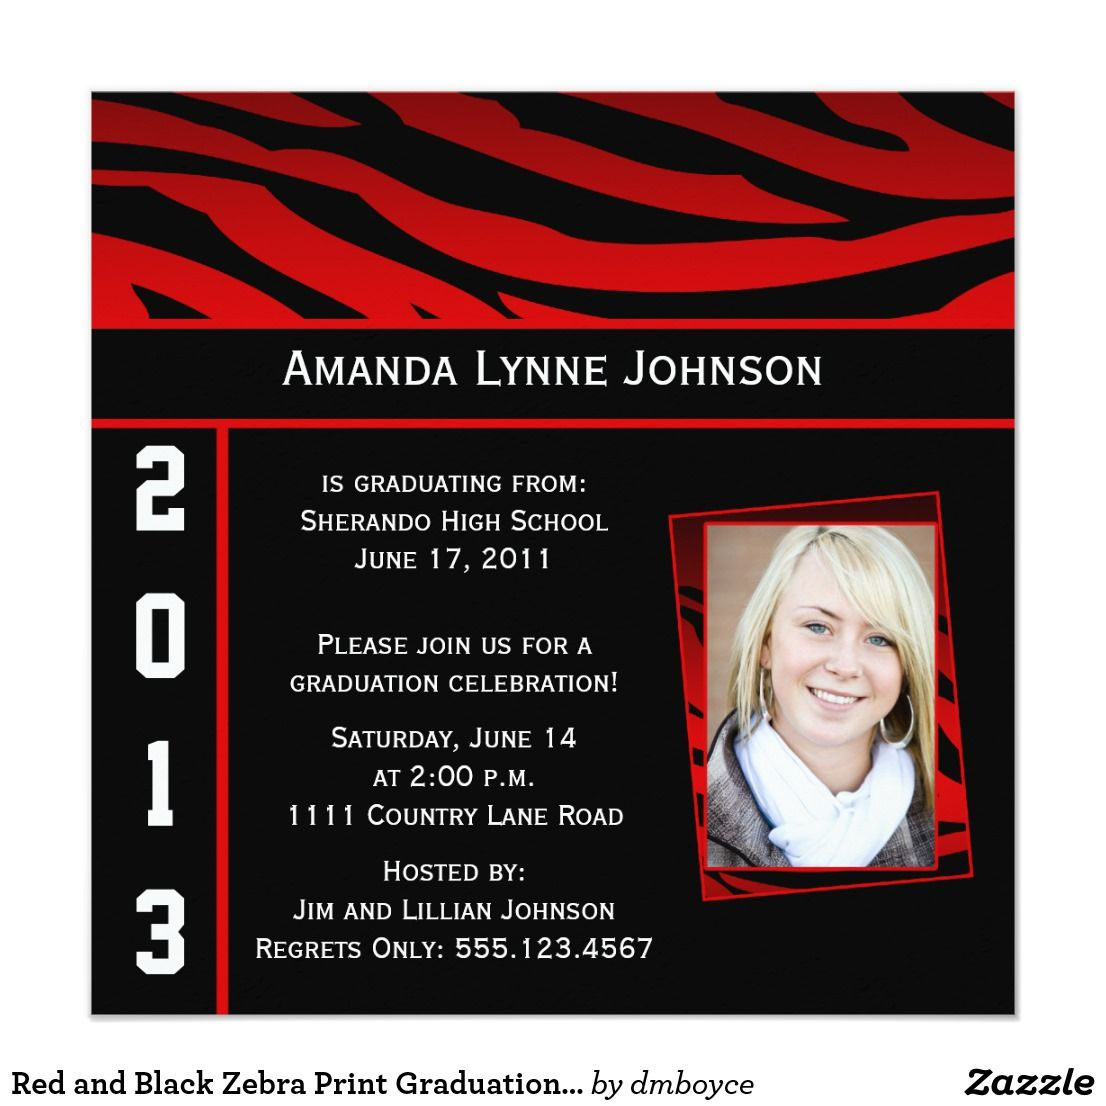 Famous zazzle graduation invitations frieze resume ideas red and black zebra print graduation invitation red and black zebra filmwisefo